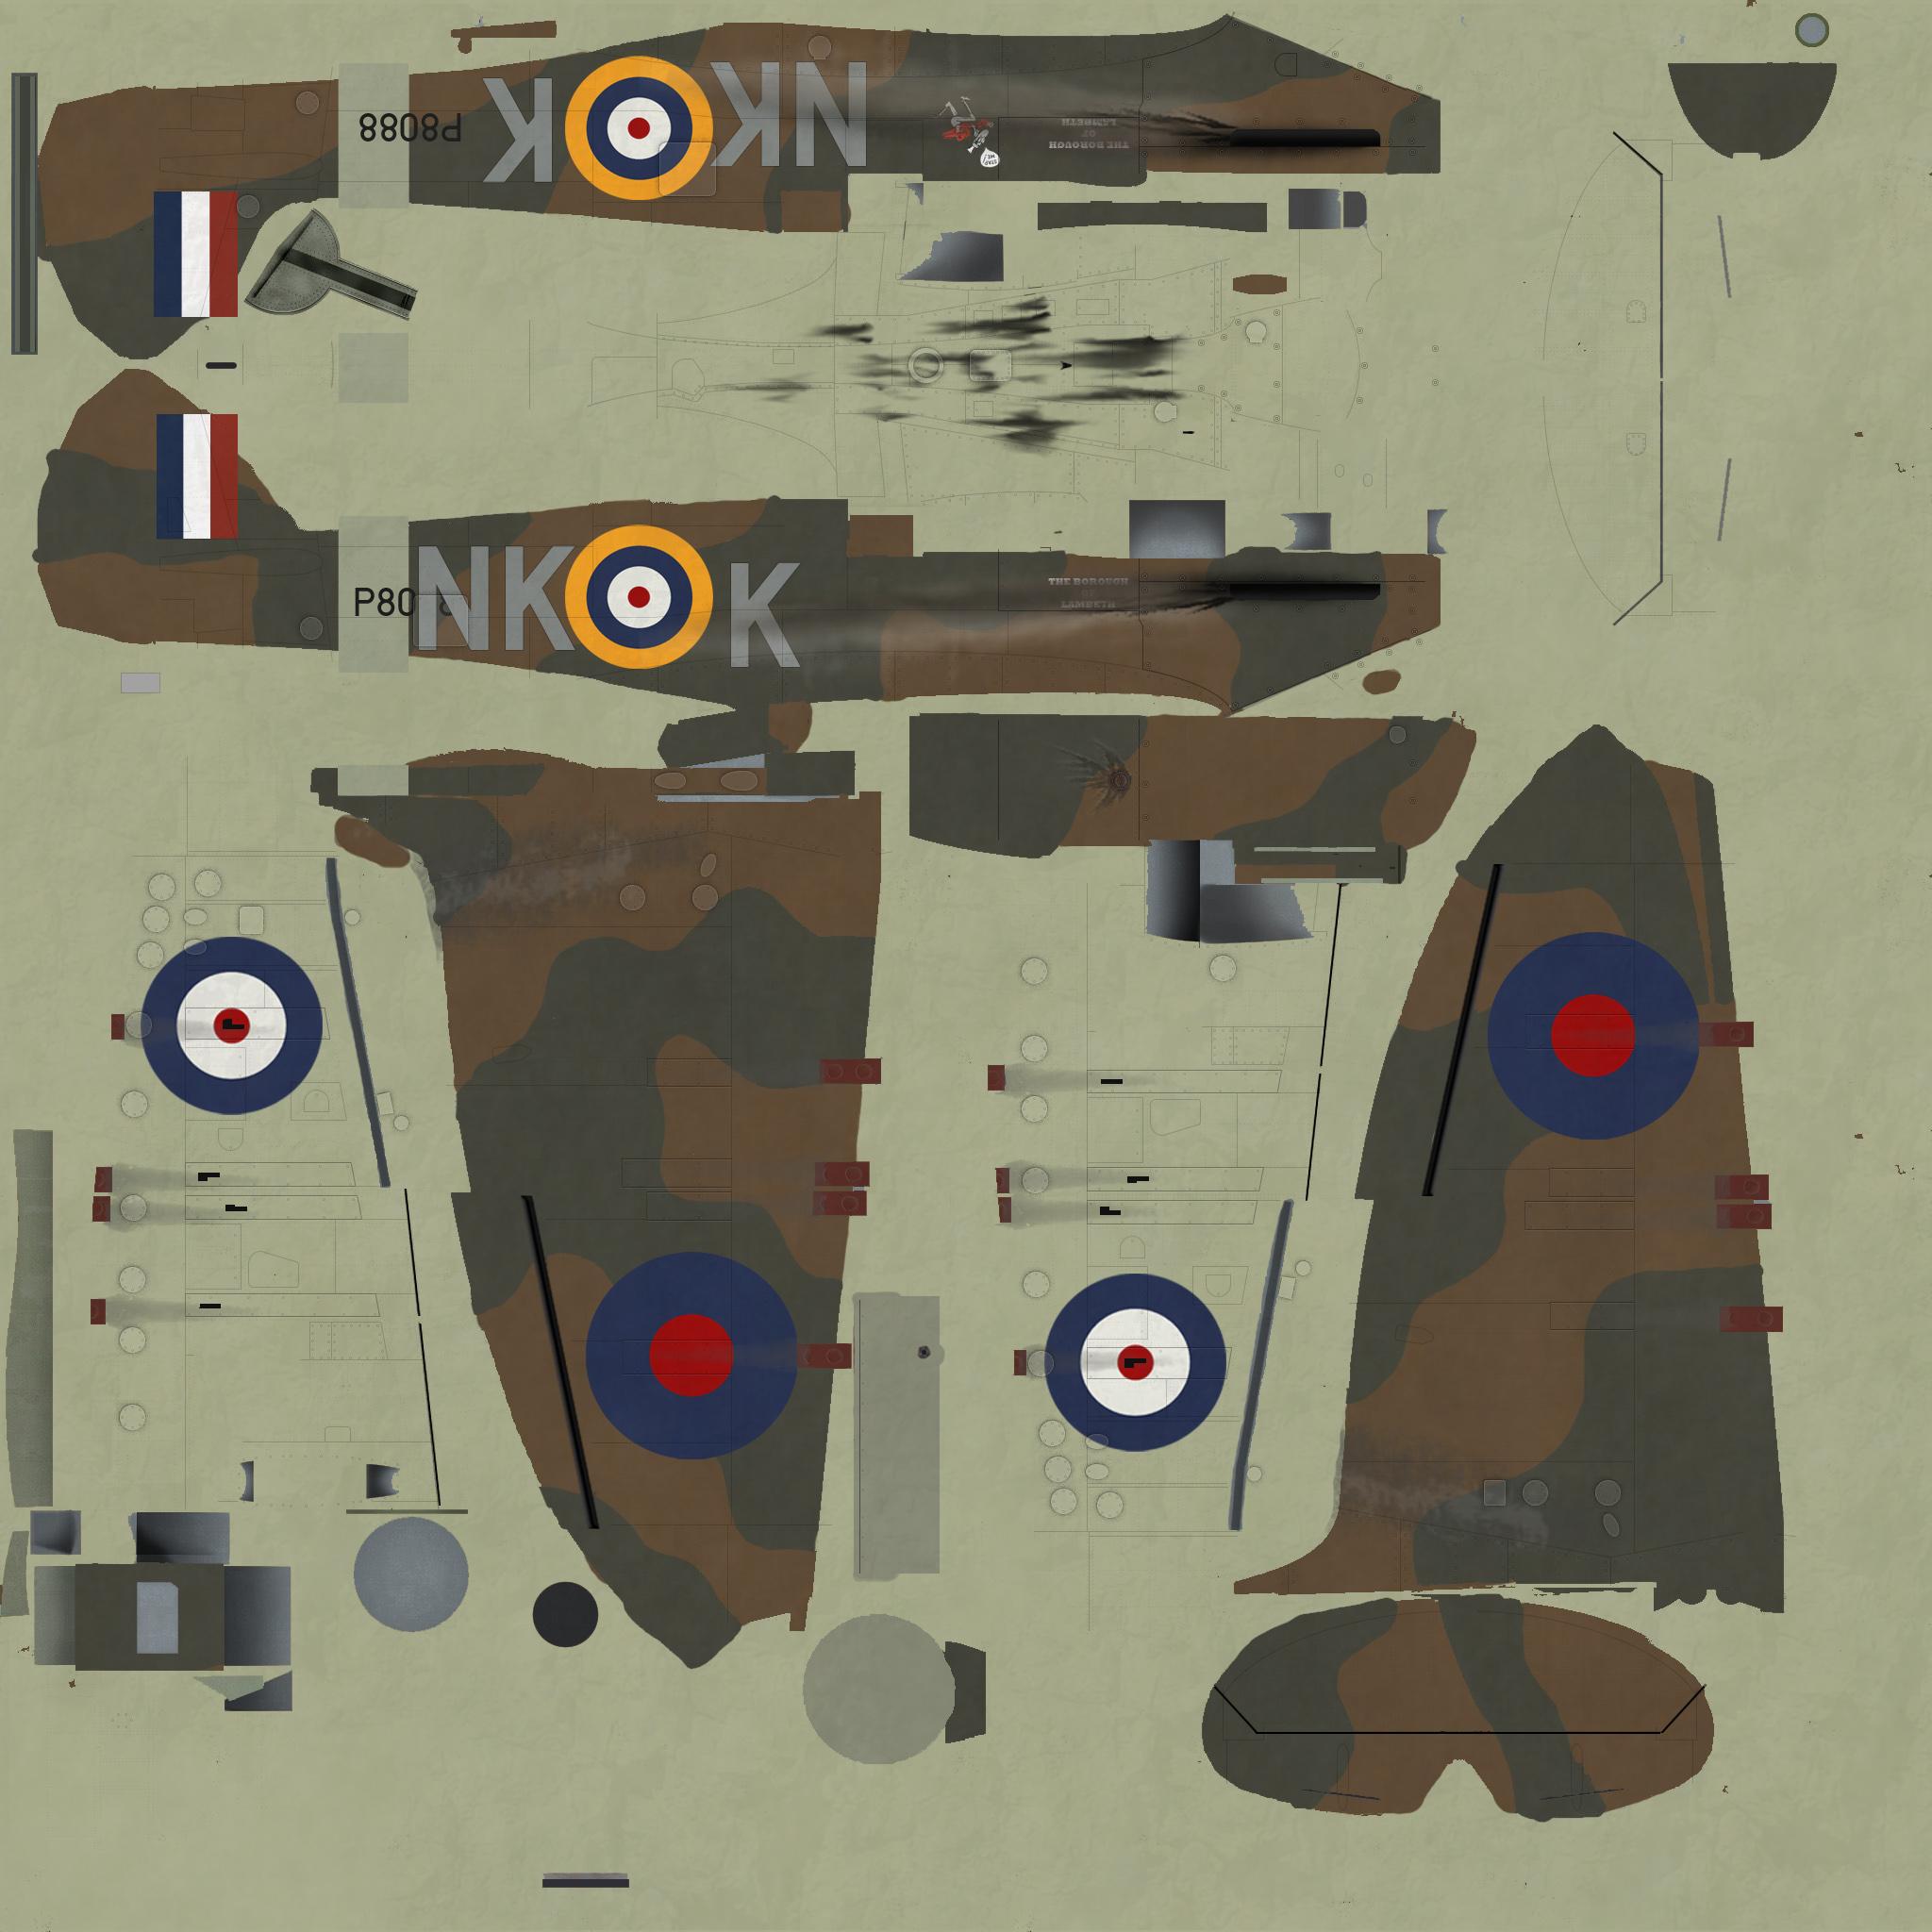 COD KF MkI RAF 118Sqn NKK P8088 Lumsden in Ibsley May 1941